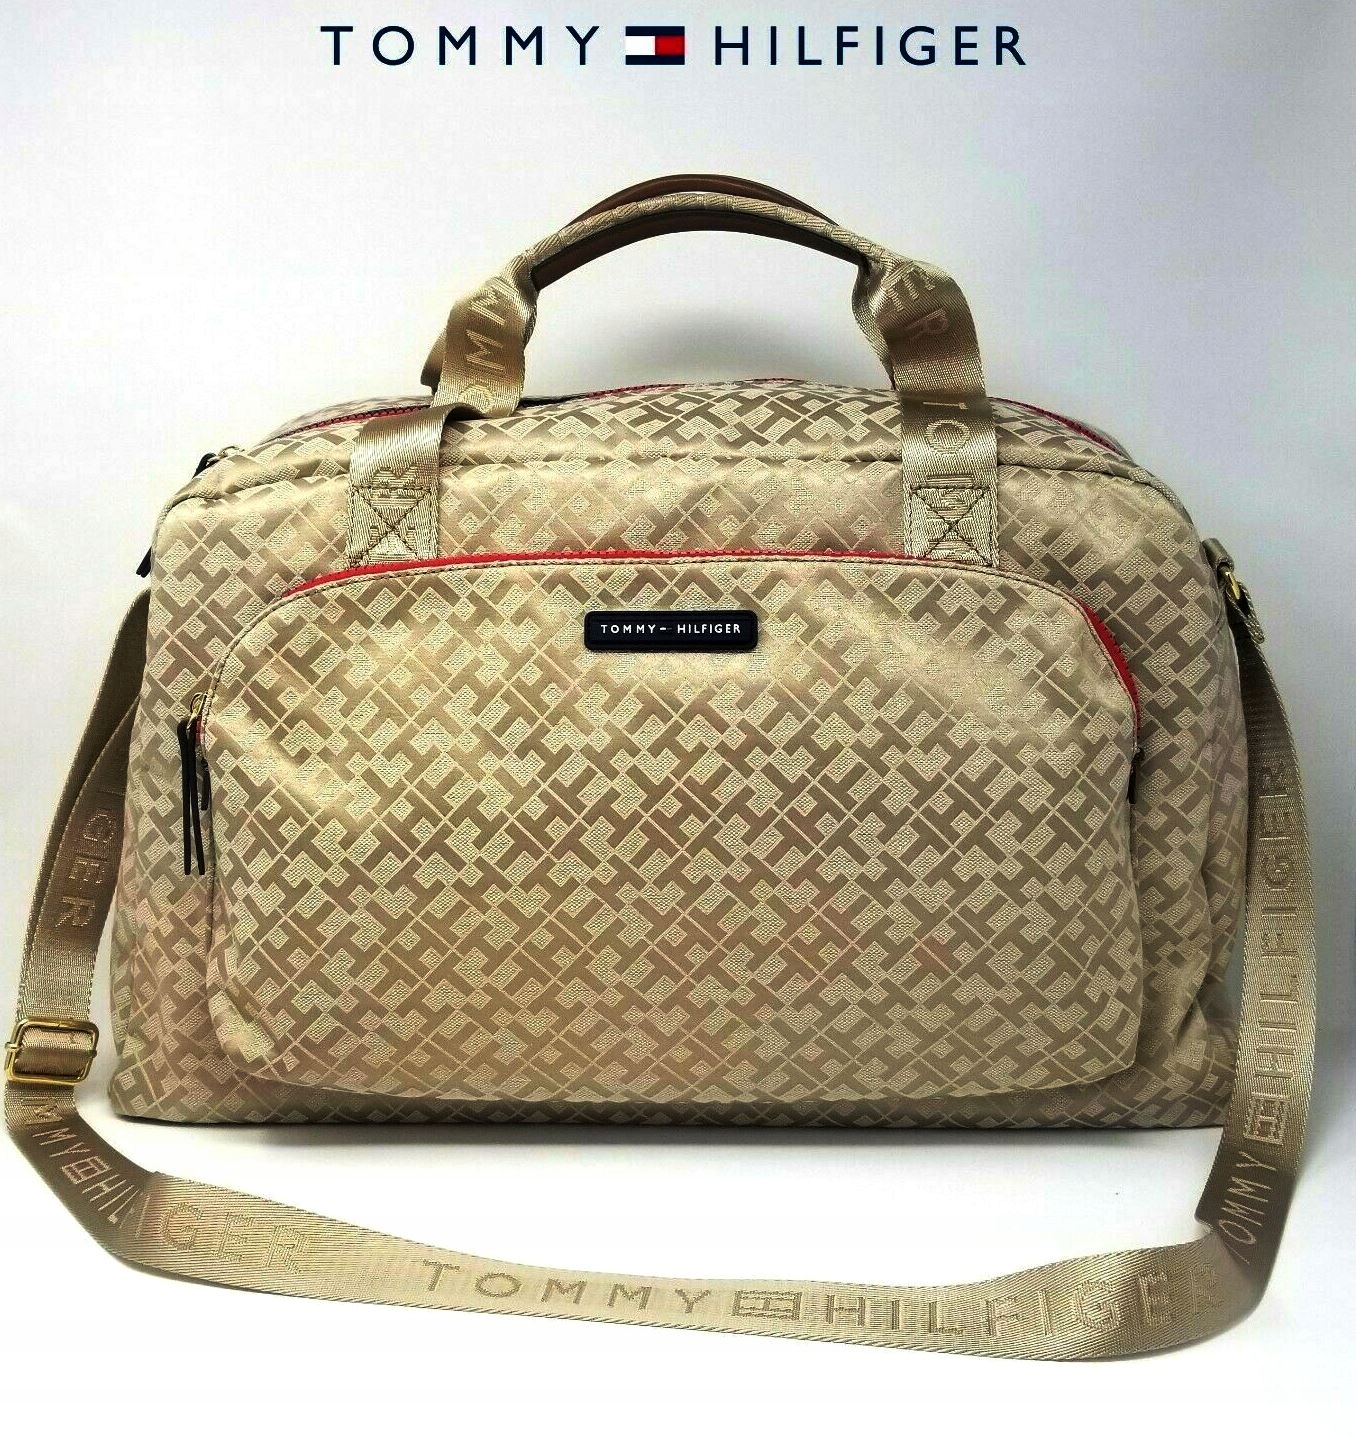 Tommy Hilfiger torba podrozna na silownie torebka